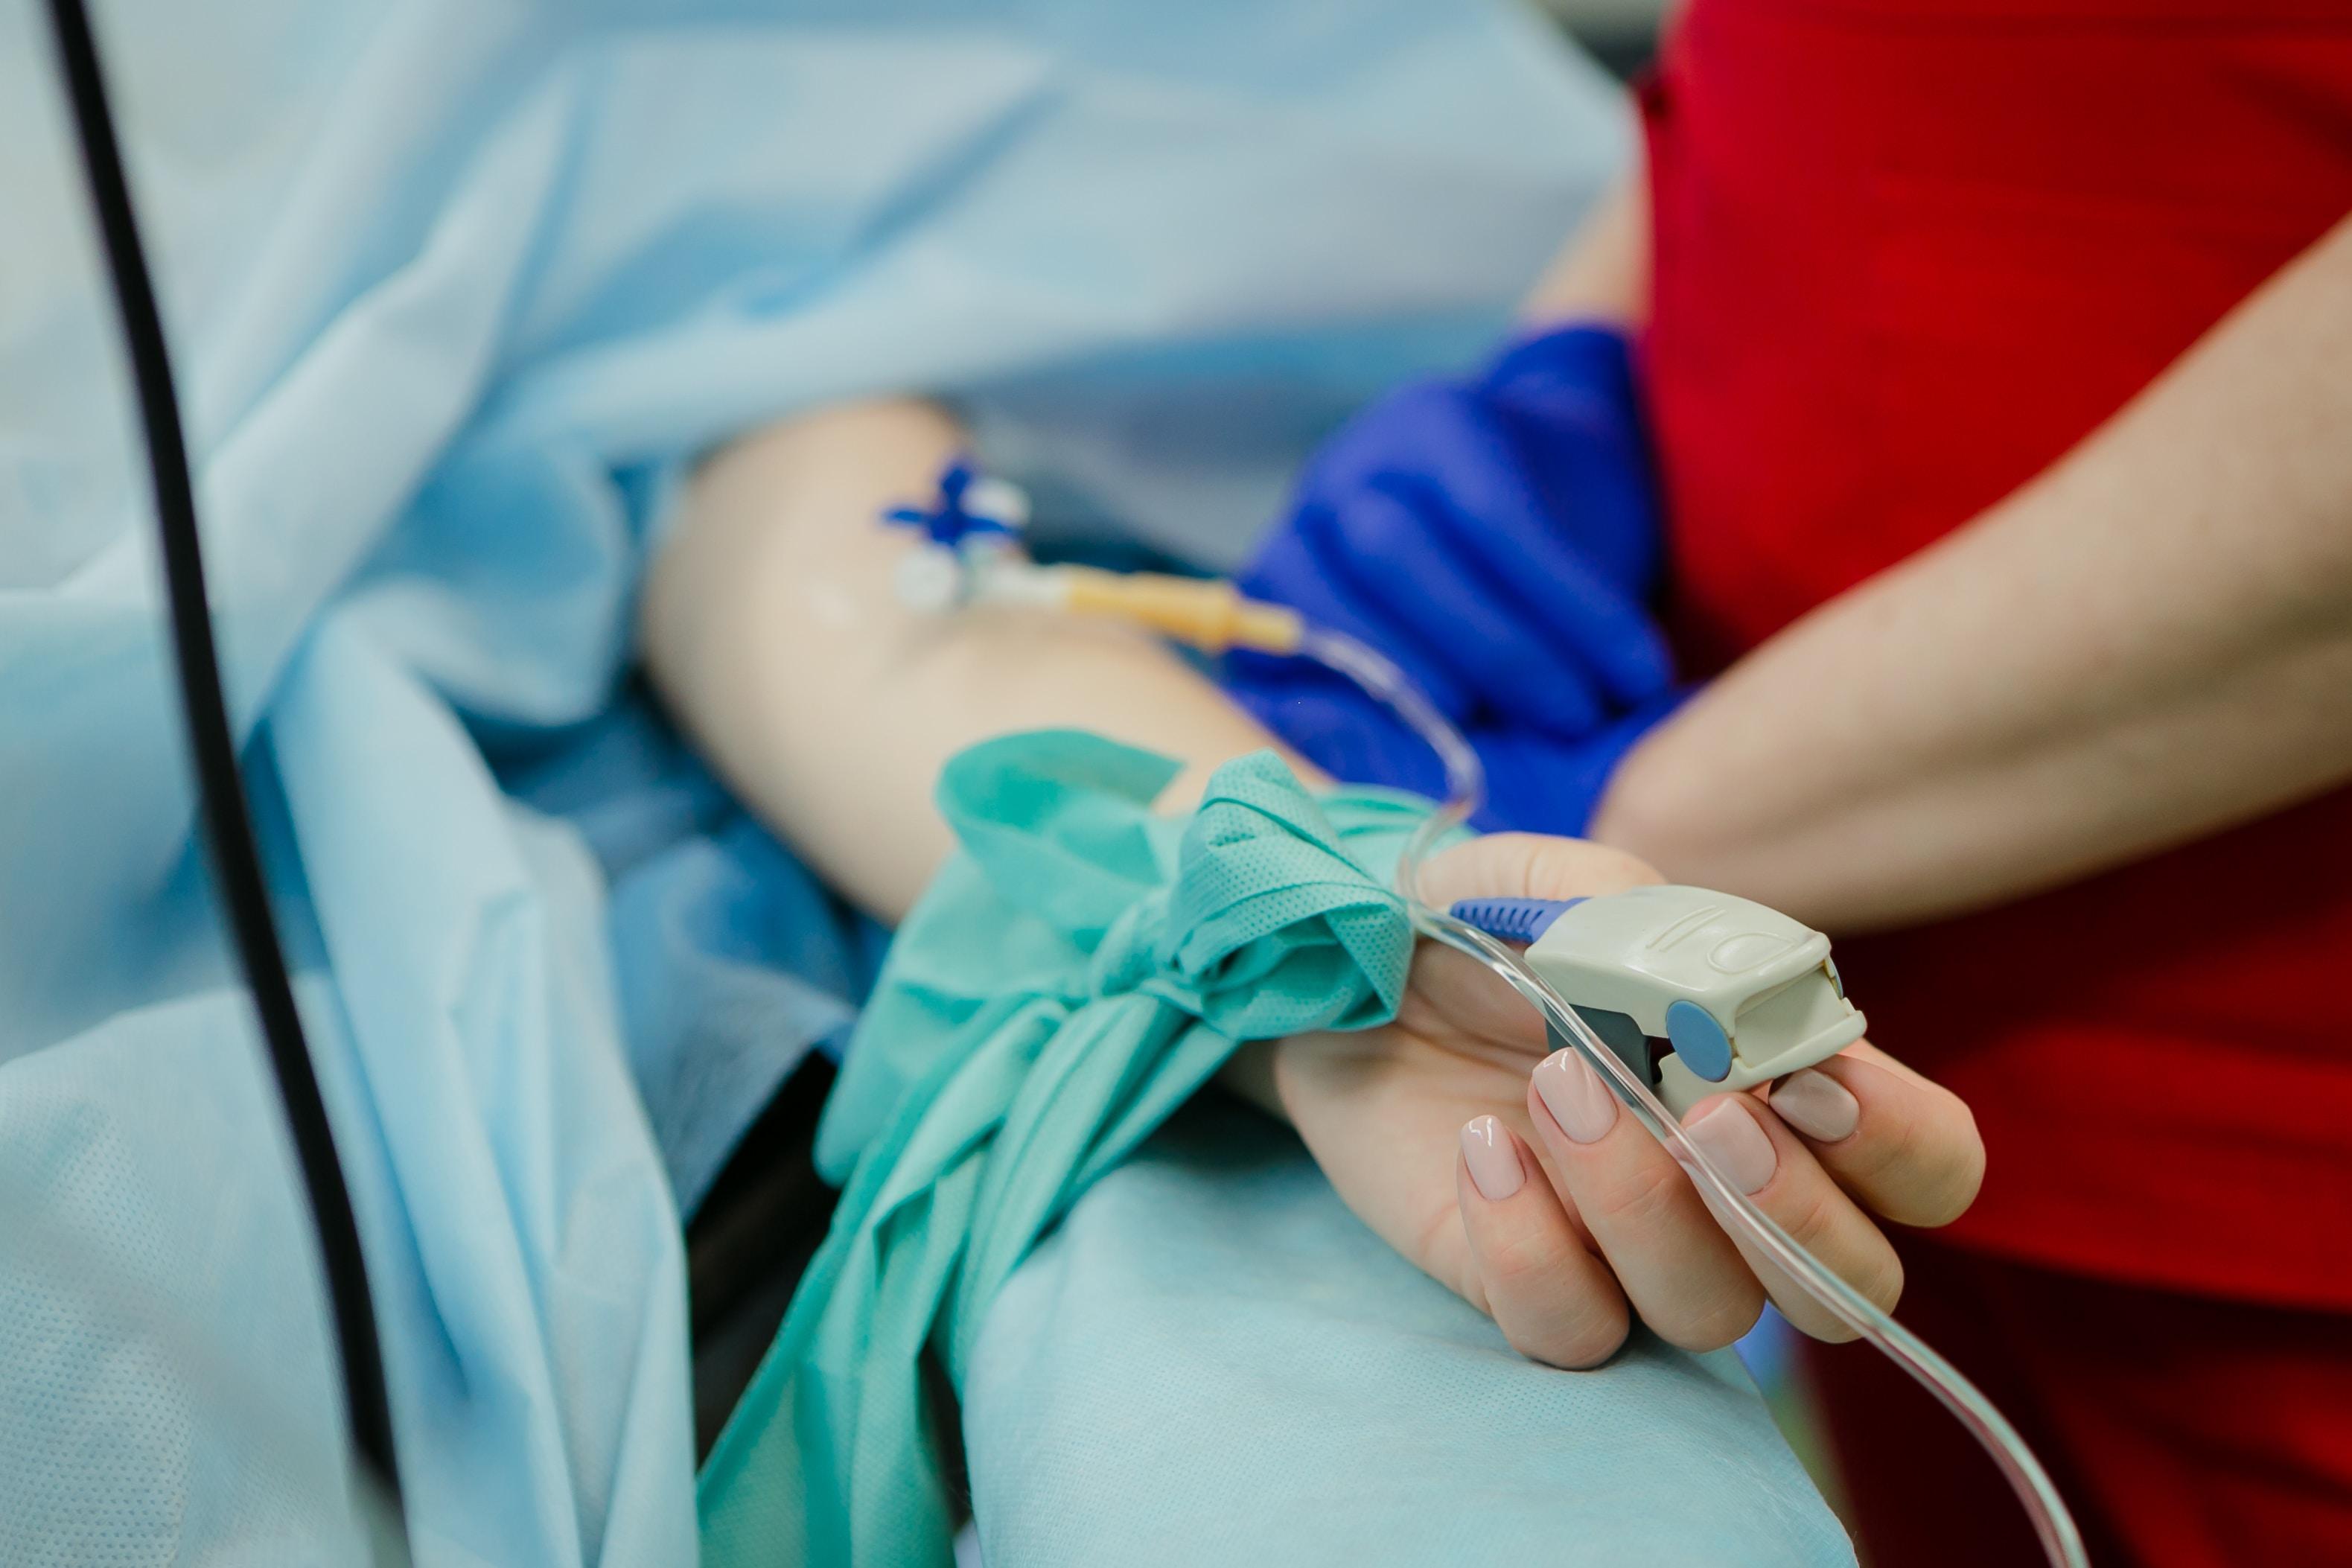 Woman's hand on hospital bed, Photo Credit: Unsplash / Olga Kononenko